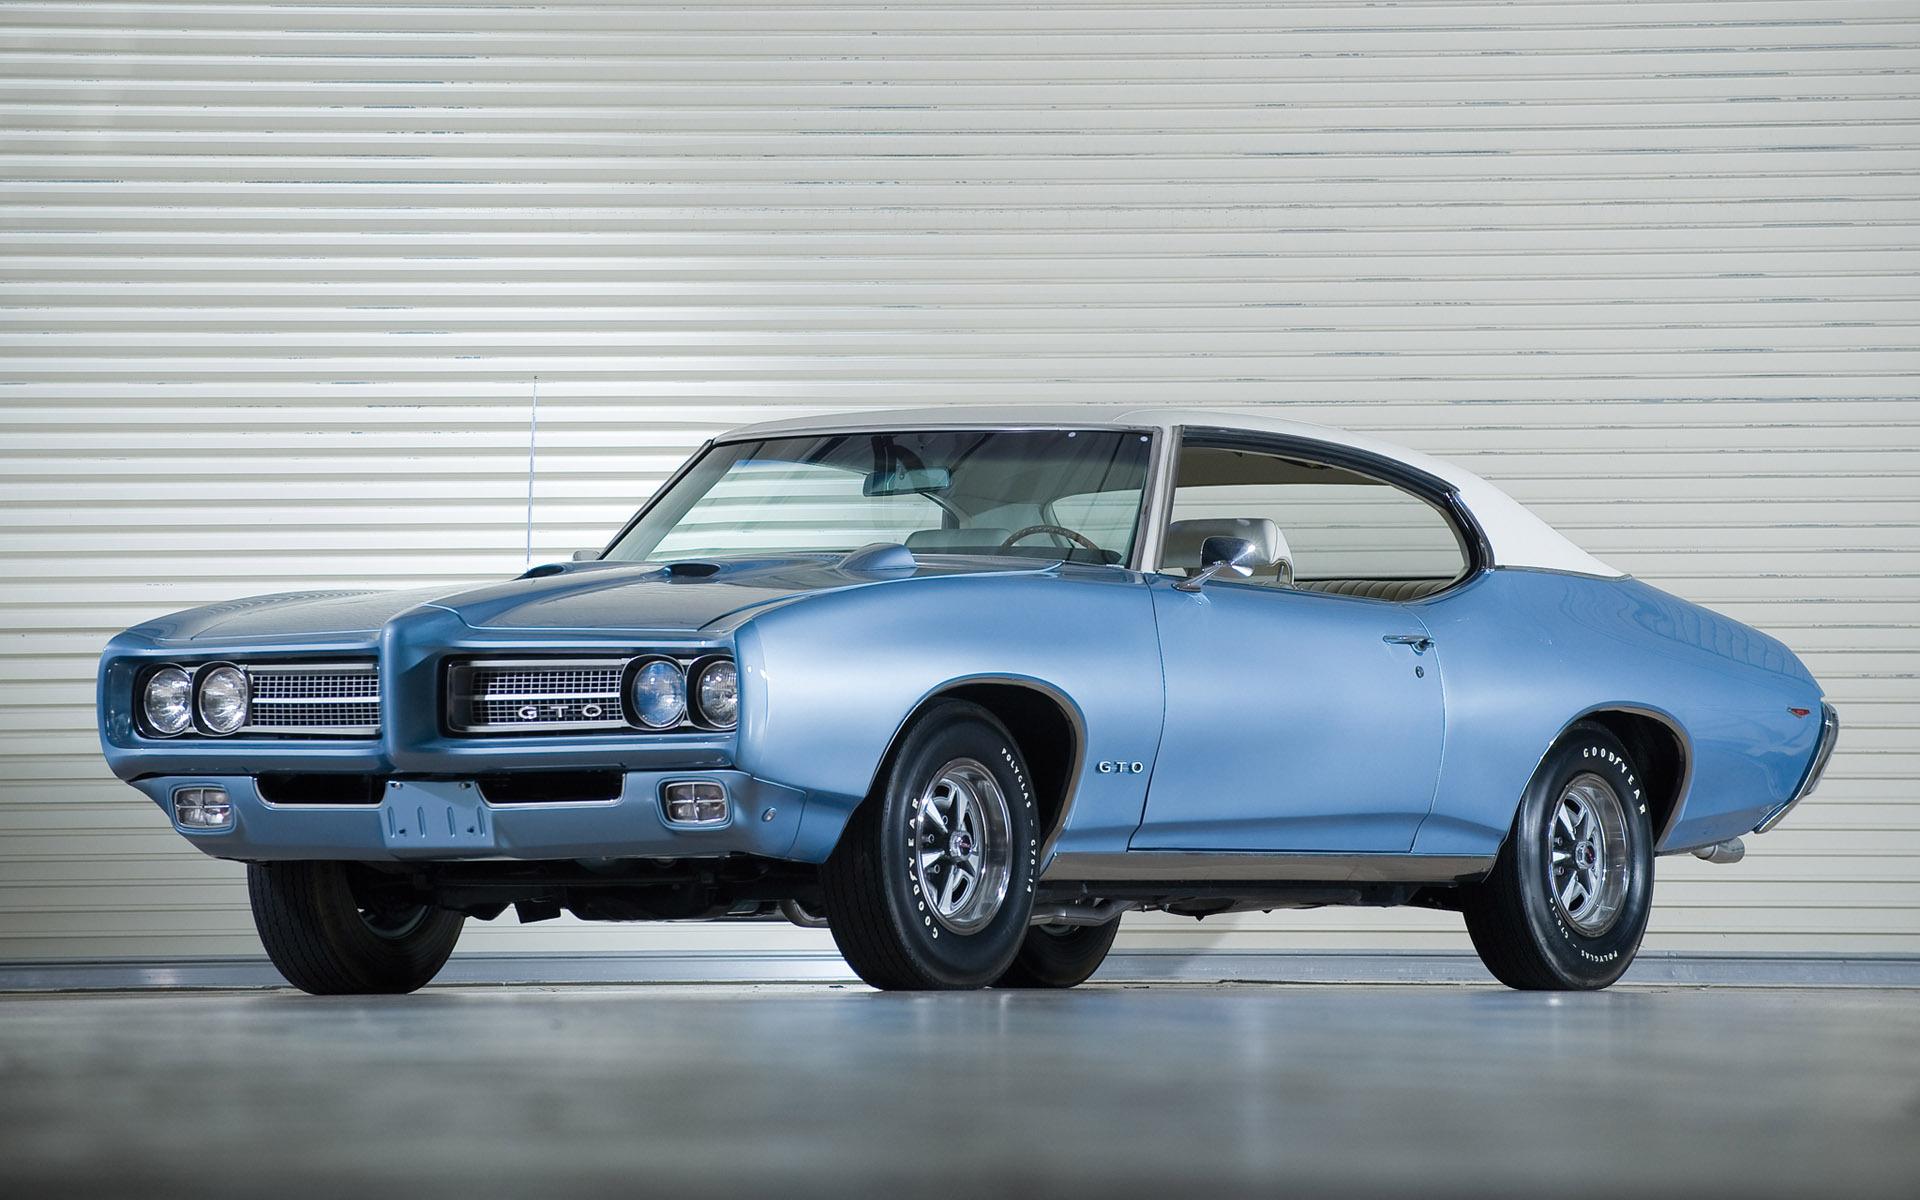 1969 Pontiac GTO wallpaper 19507 1920x1200